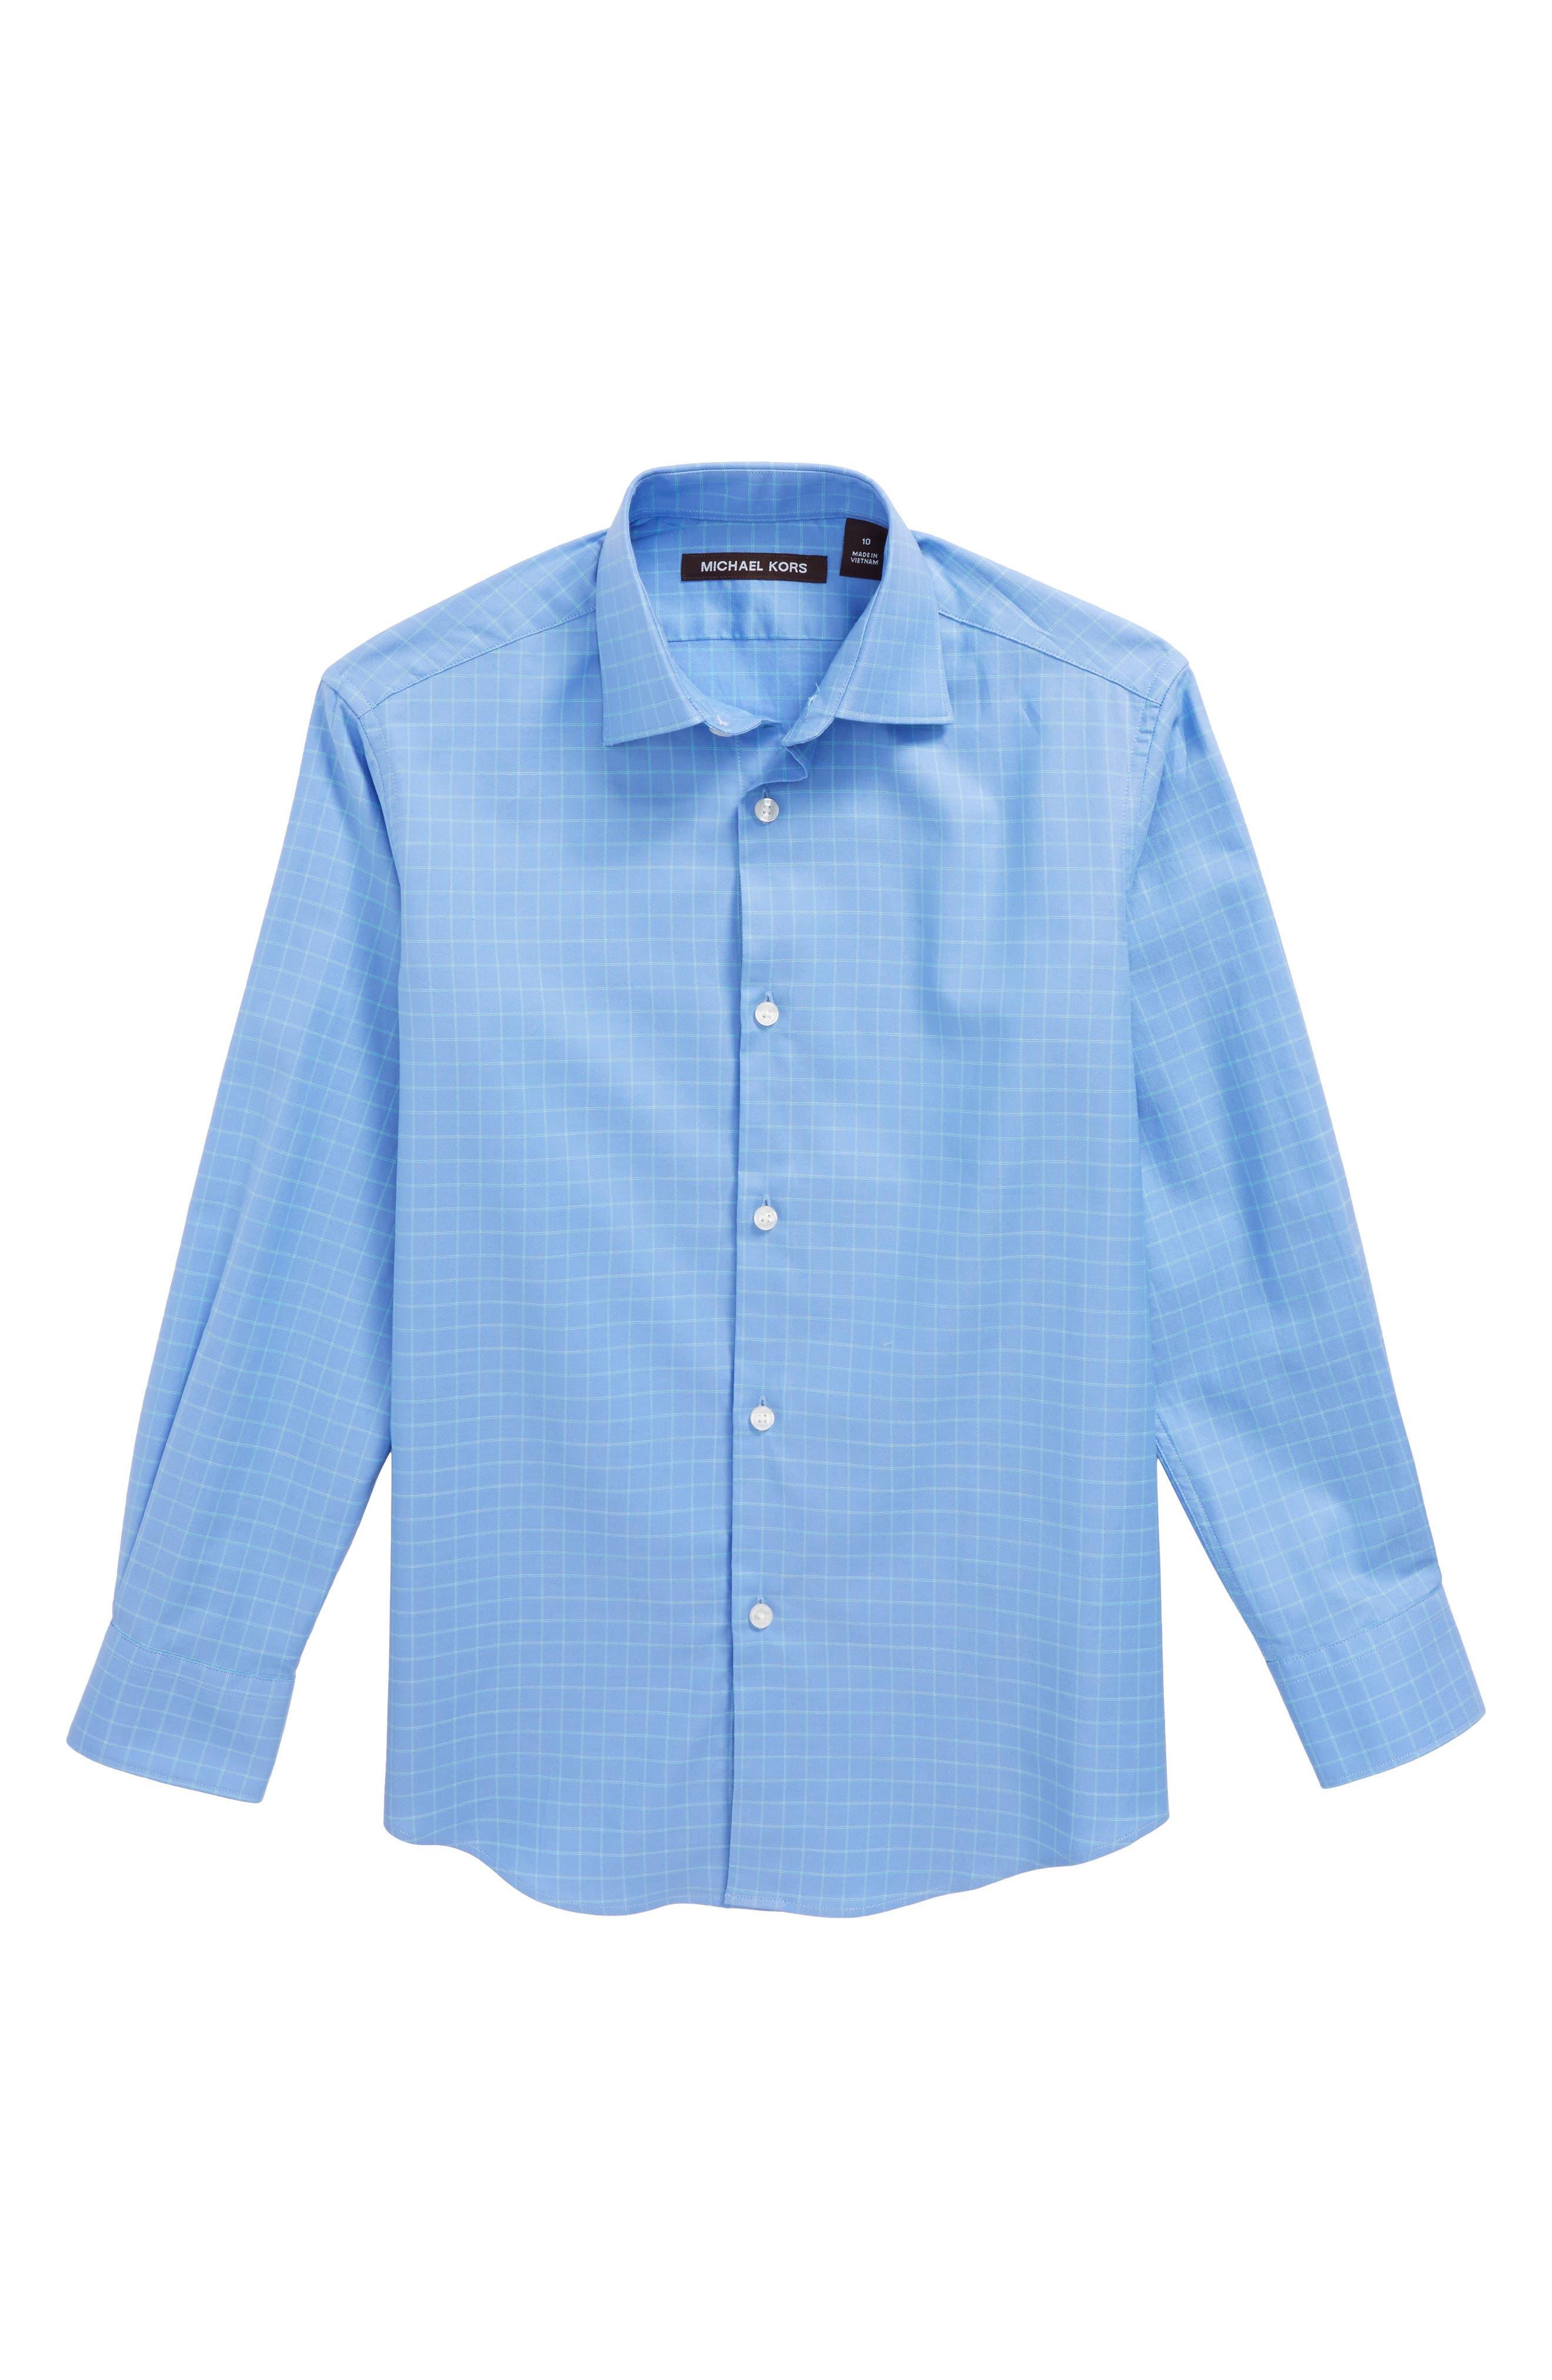 Collection Check Dress Shirt,                             Main thumbnail 1, color,                             Blue/ Green